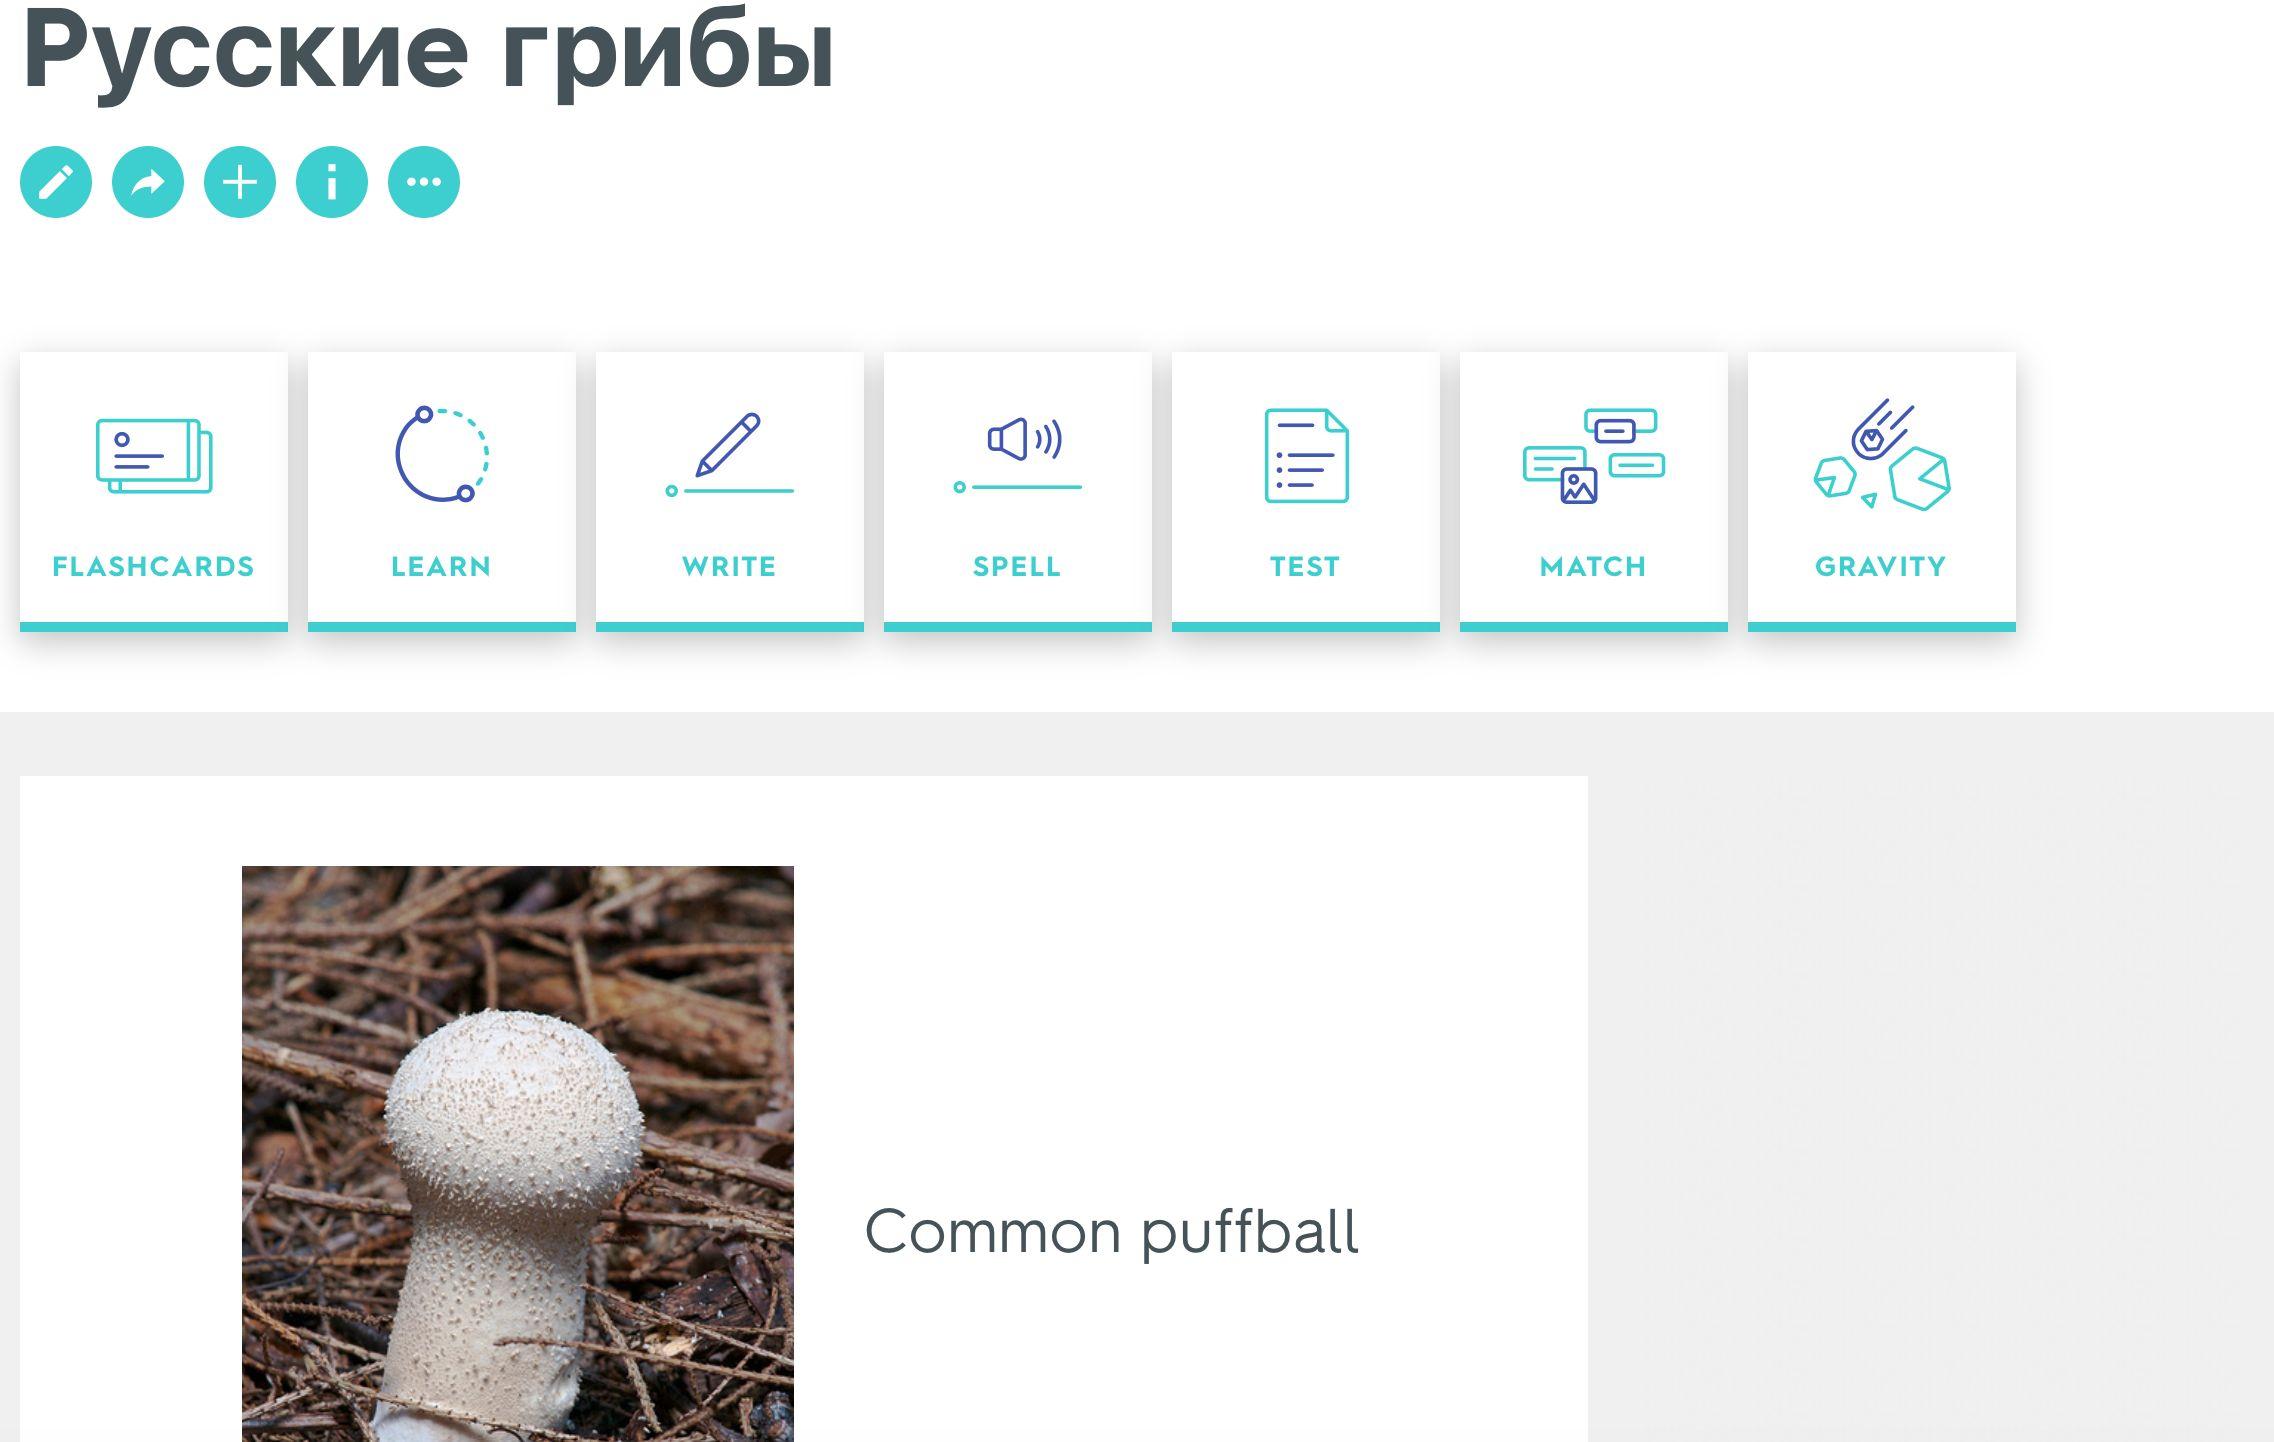 Image may contain: Word, Text, Calendar, Plant, Mushroom, Fungus, Flora, Amanita, Agaric, Pill, Medication